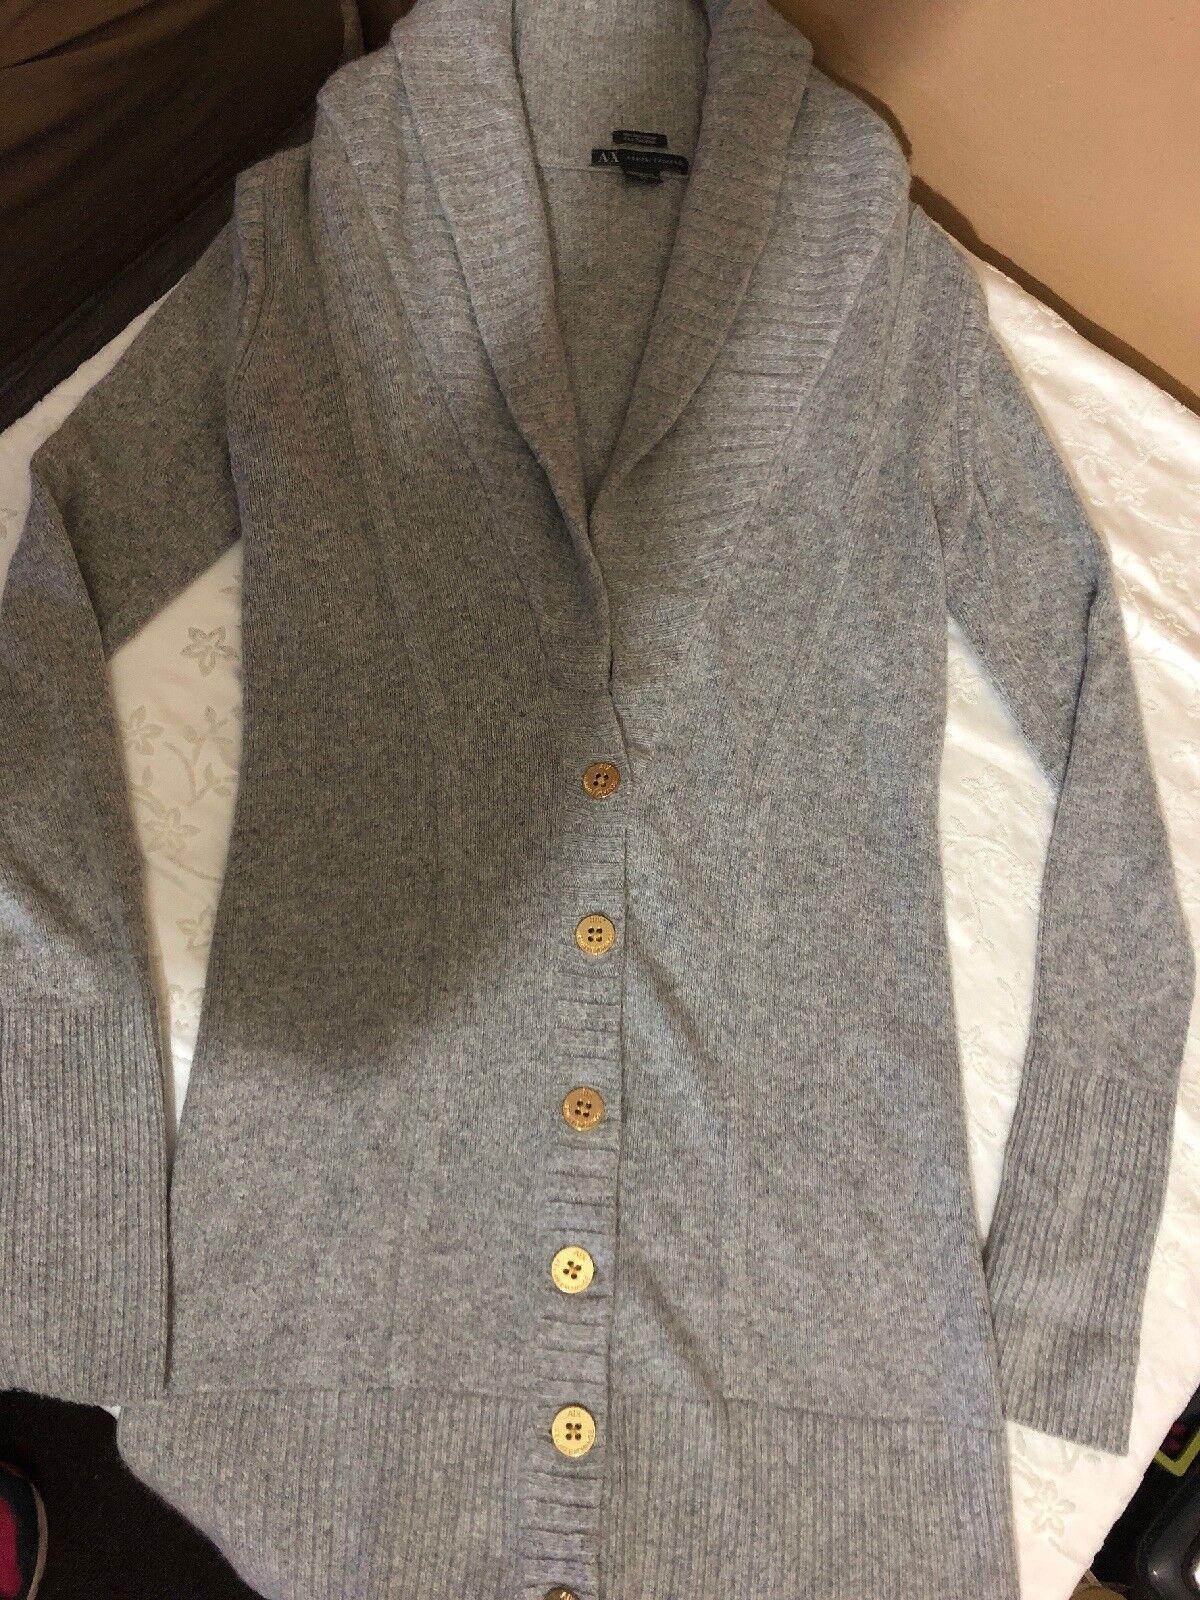 Women Sweater. Armani Exchange Brand.size Medium. Grey color. Coat Style.used.